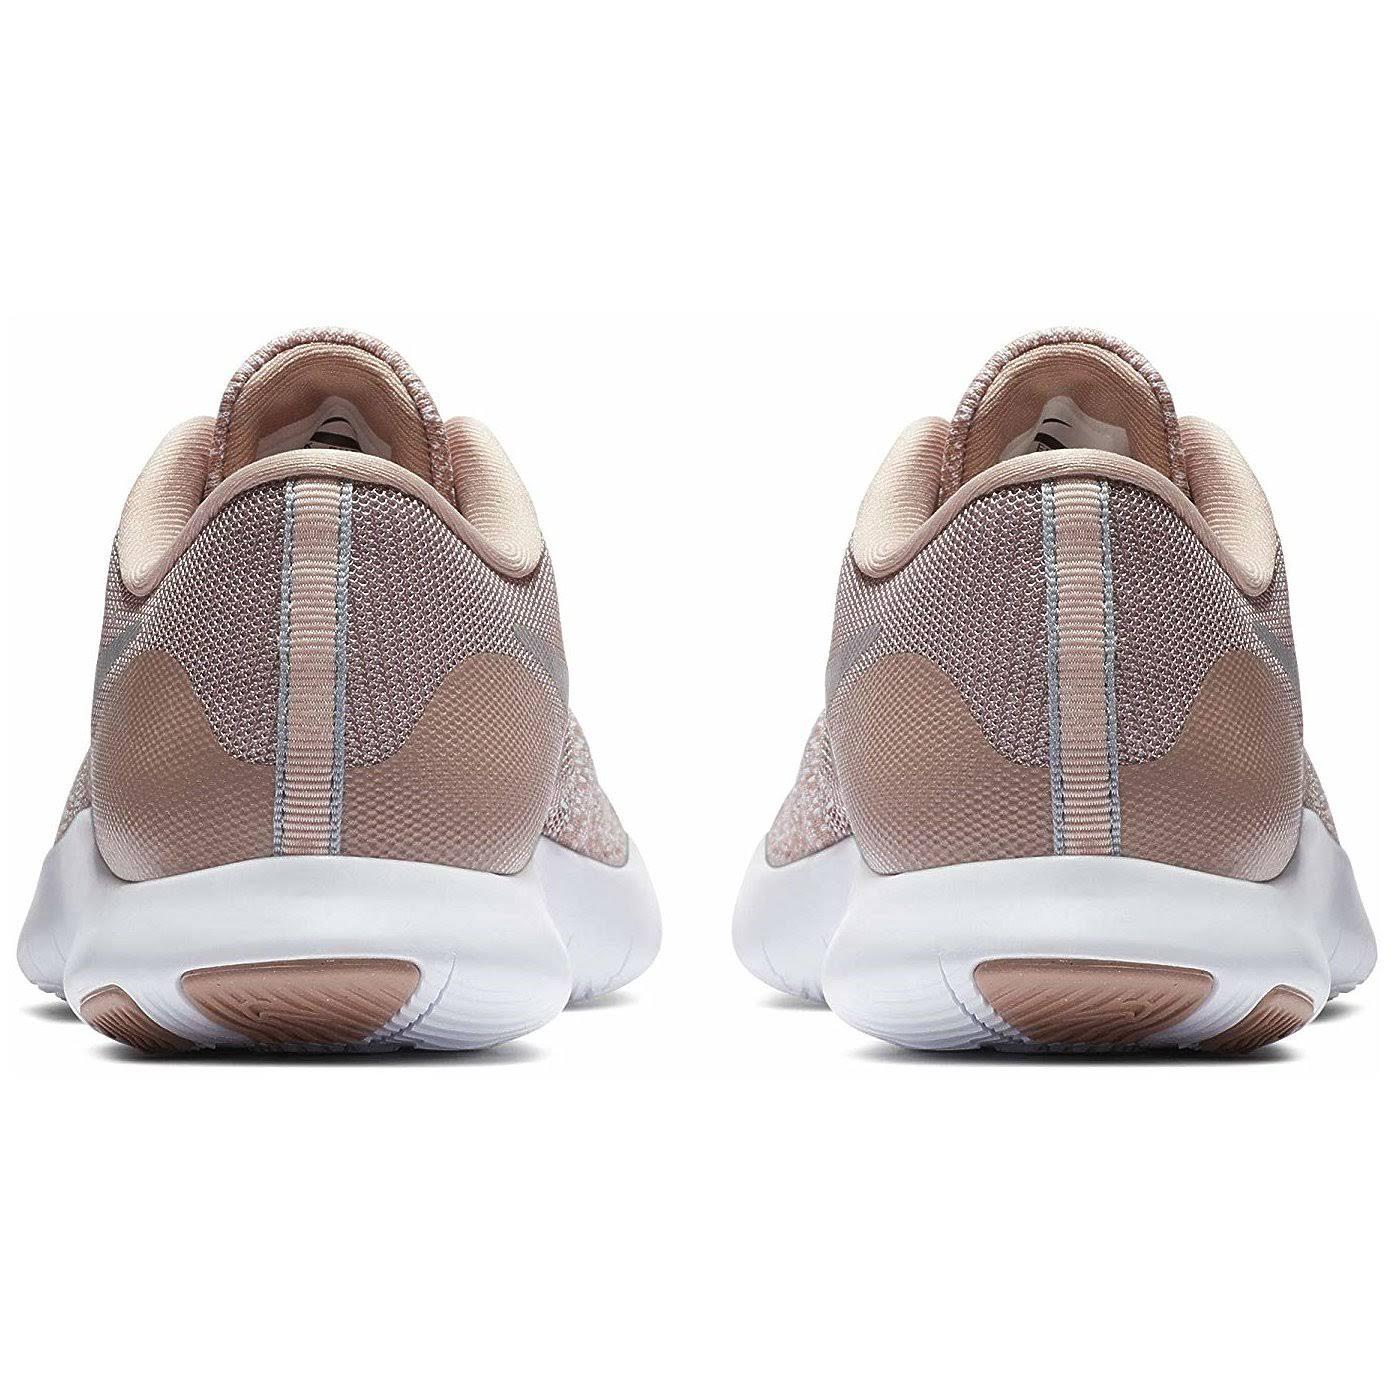 908995 102 Contact Flex De Mujer Nike Running Para Zapatillas H10WBZcW